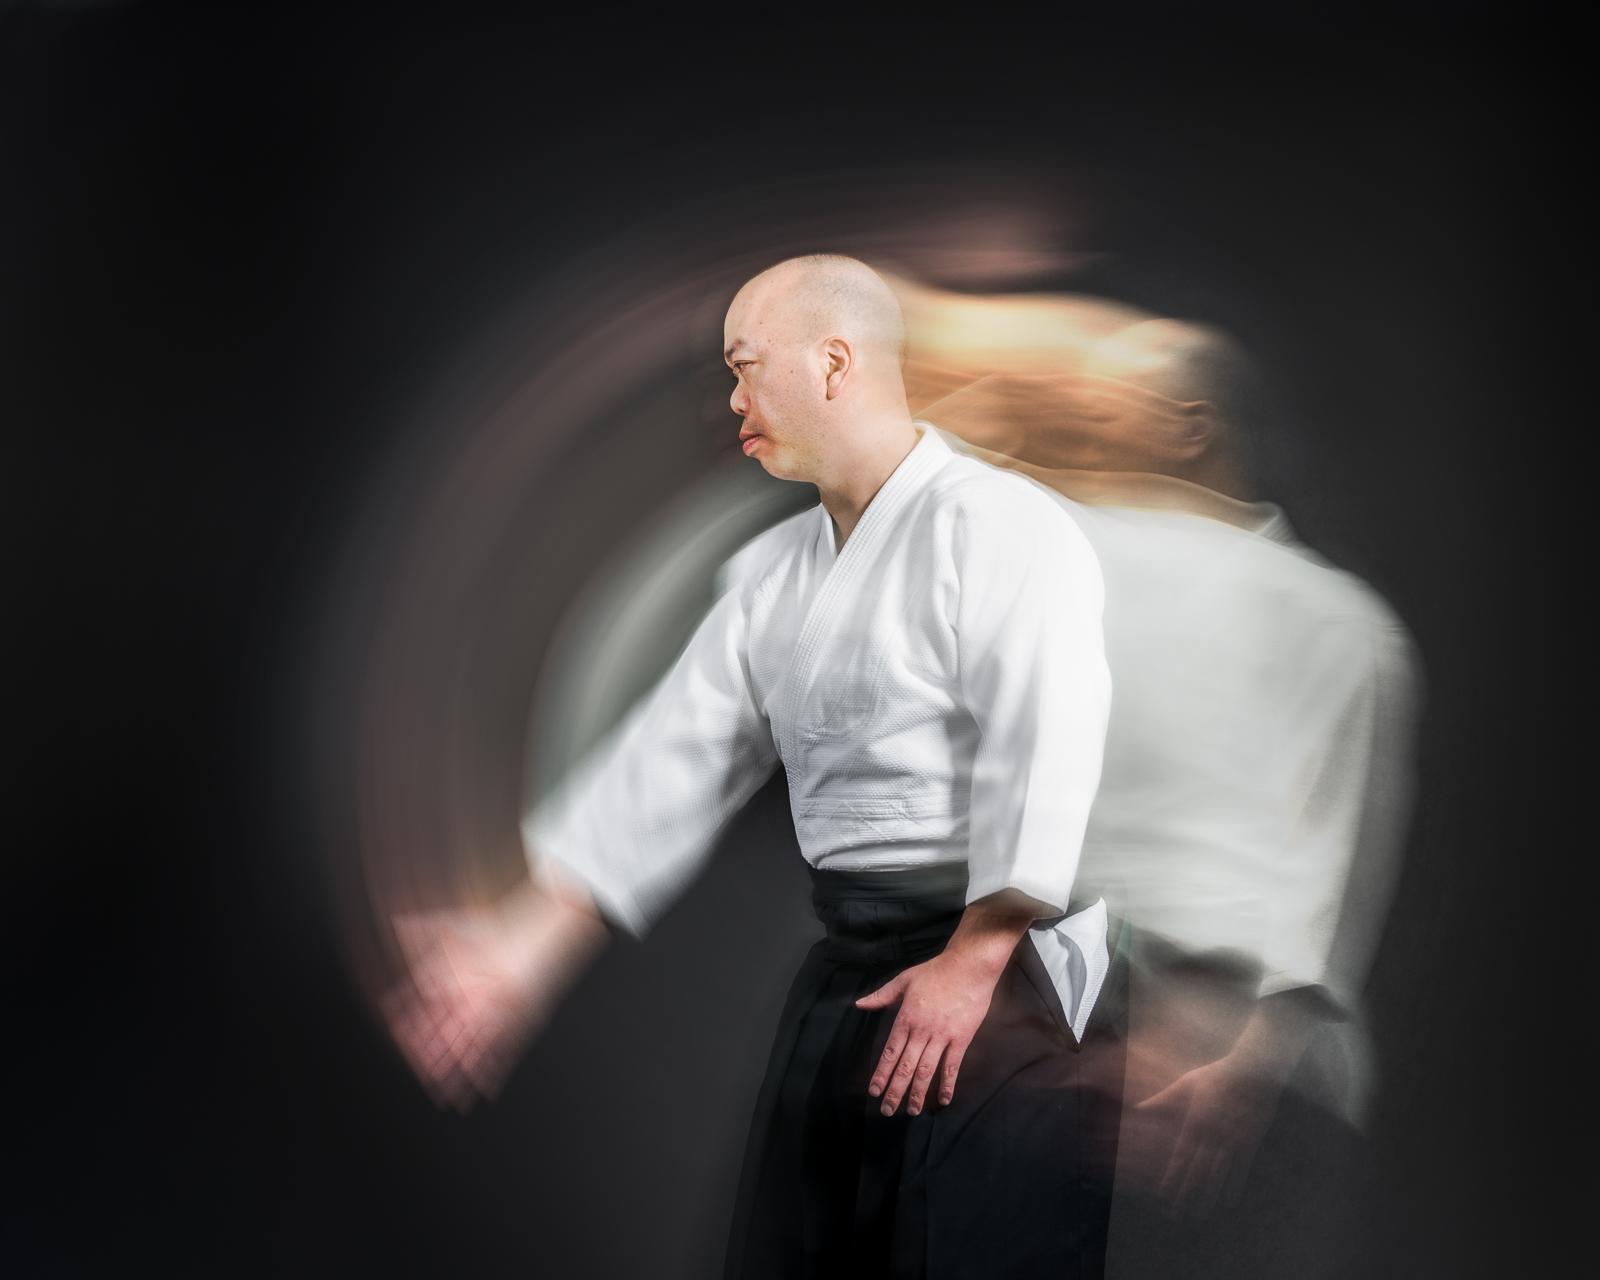 Kim Aikido